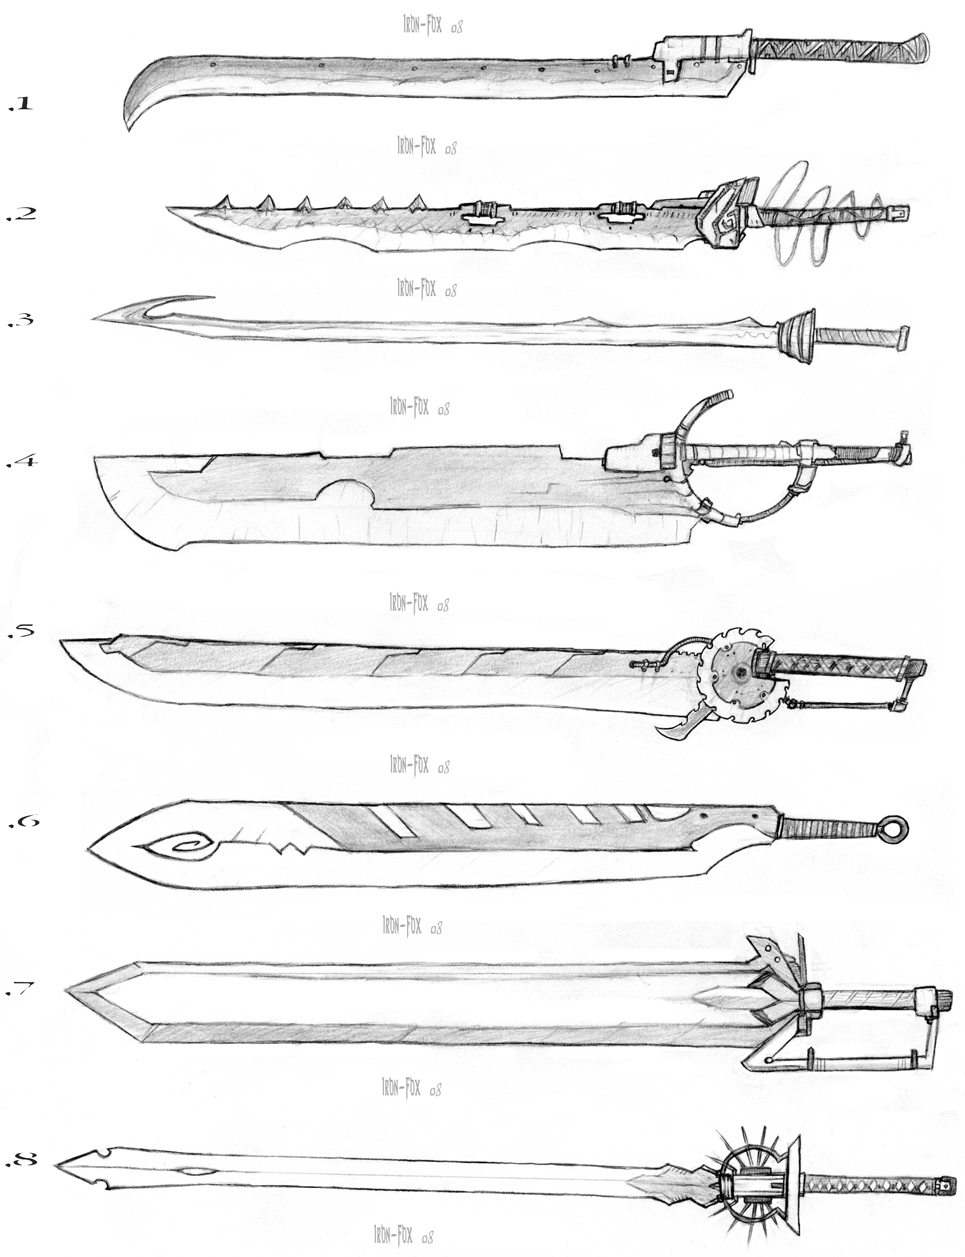 Sword Designs 2 by Iron-Fox